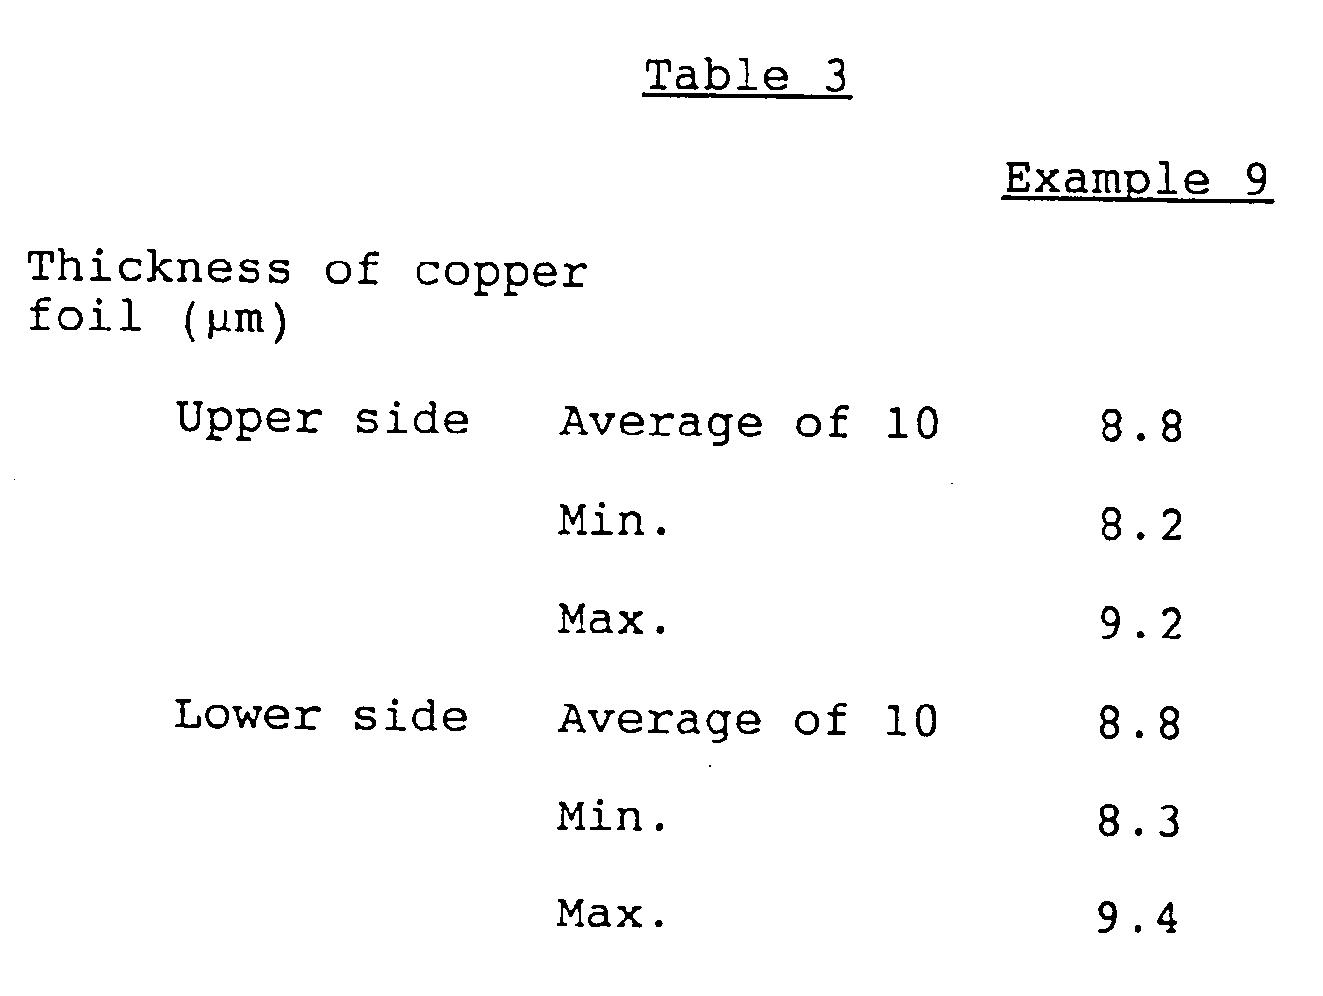 EP0342669B1 - Method for preparing thin copper foil-clad